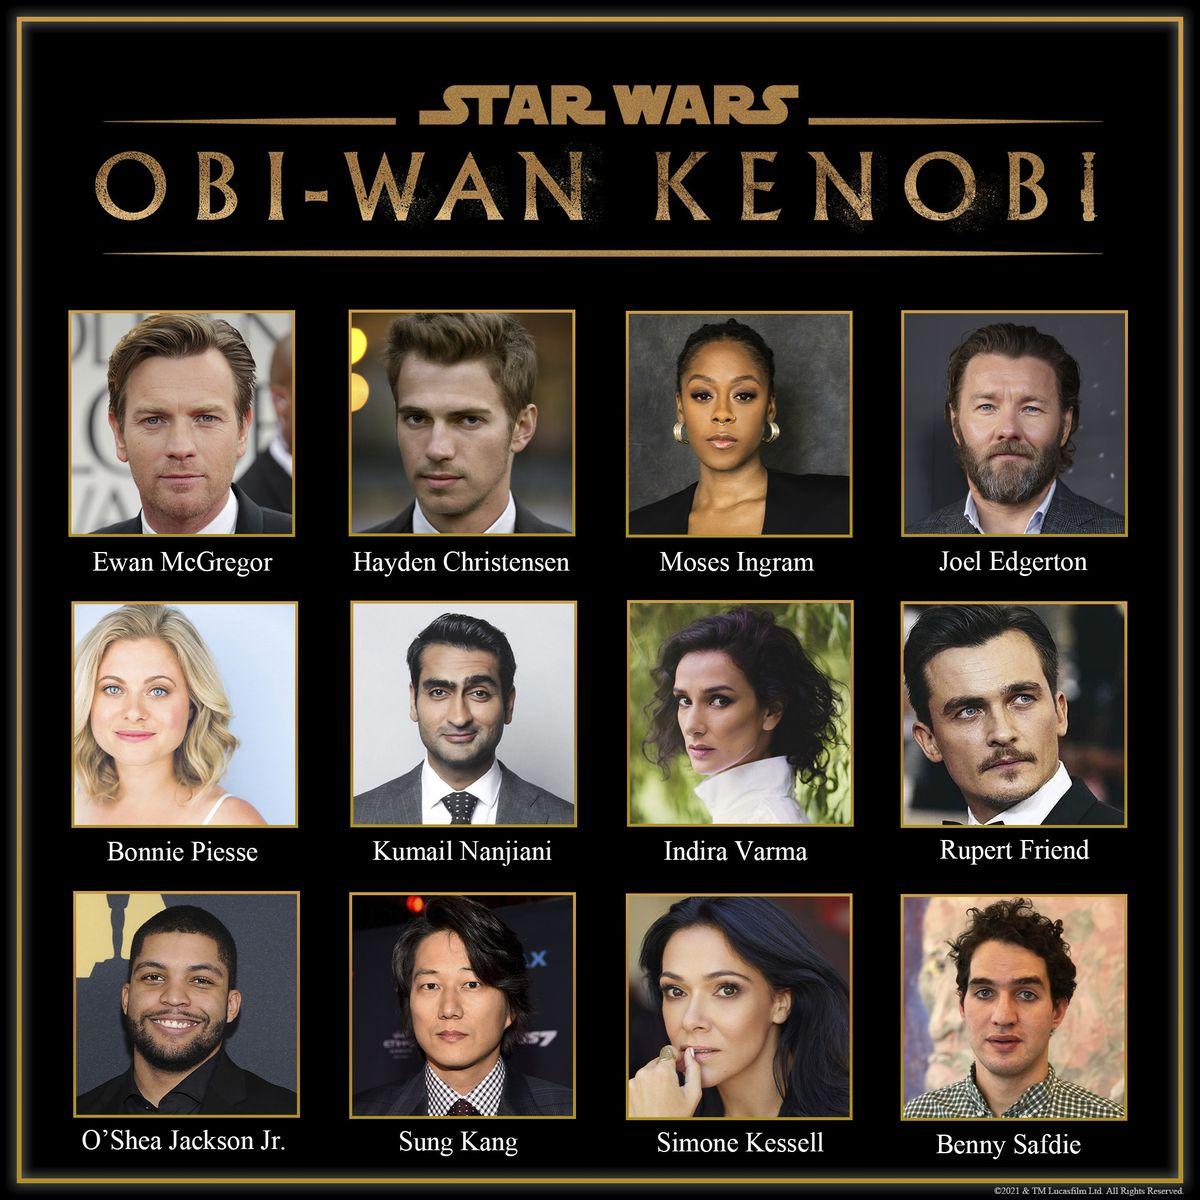 the newly announced cast of Obi-Wan Kenobi, featuring ewan mcgregor and hayden christensen